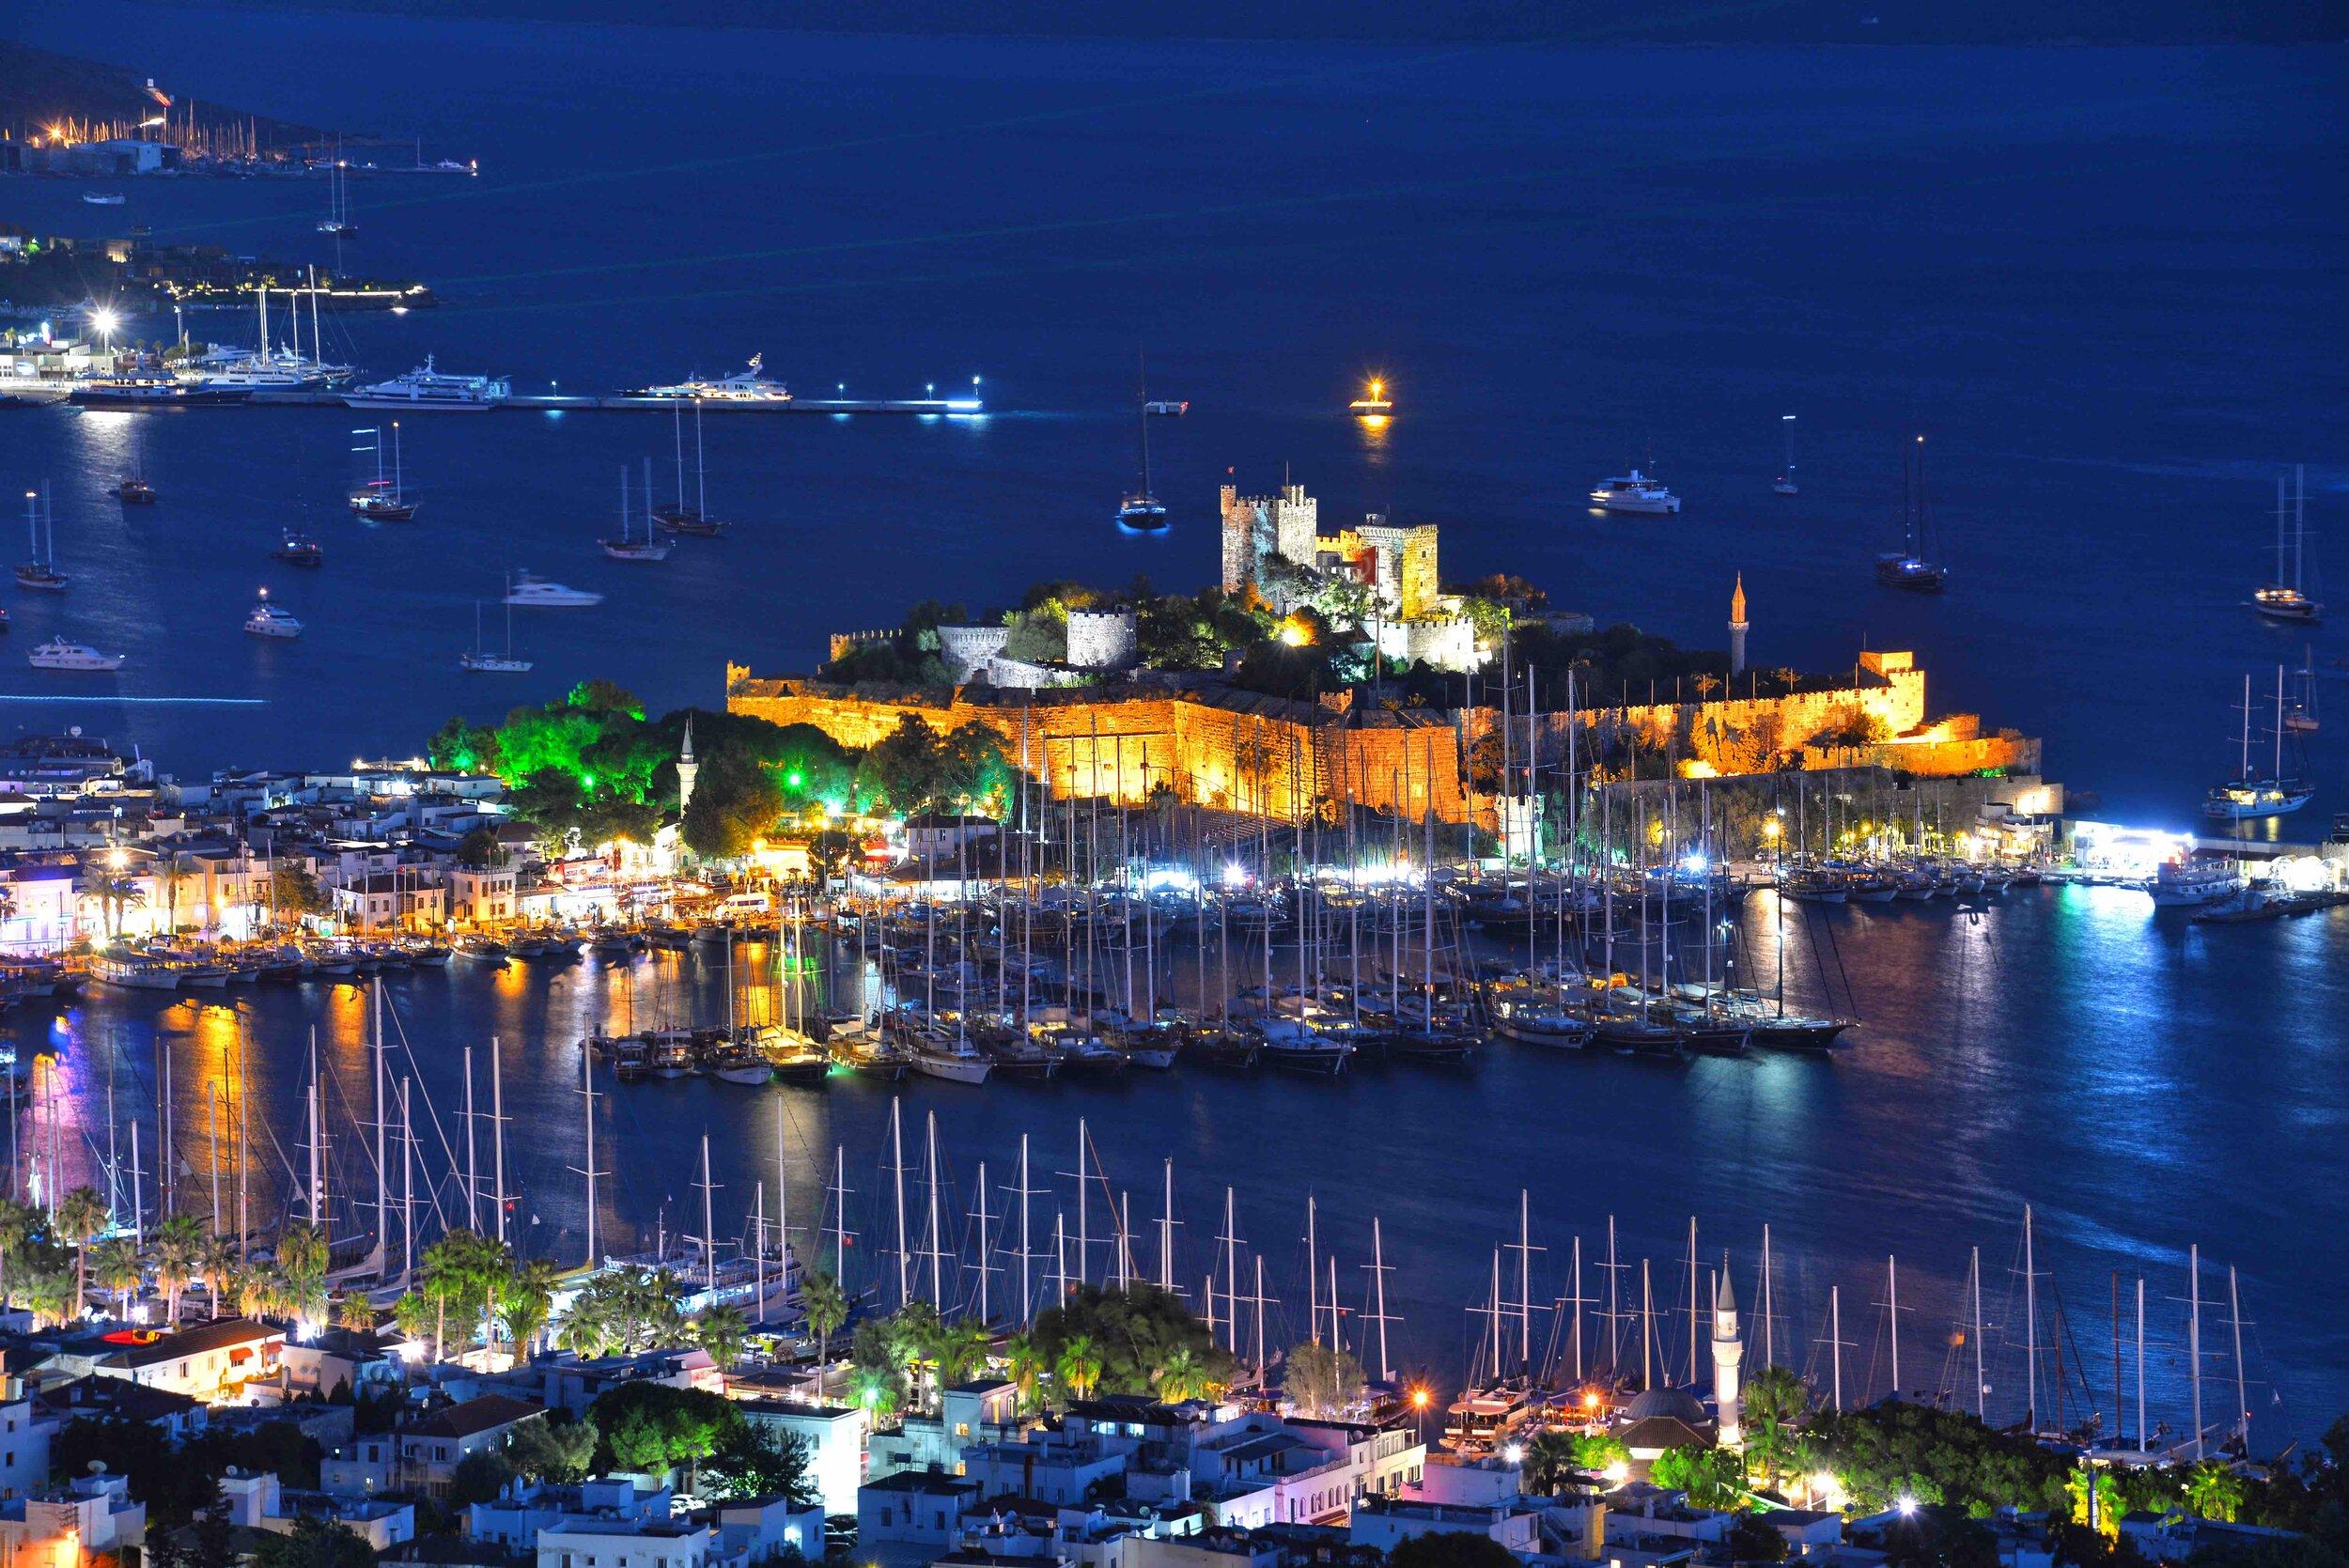 iStock-489700522 Bodrum Turkey by night.jpg